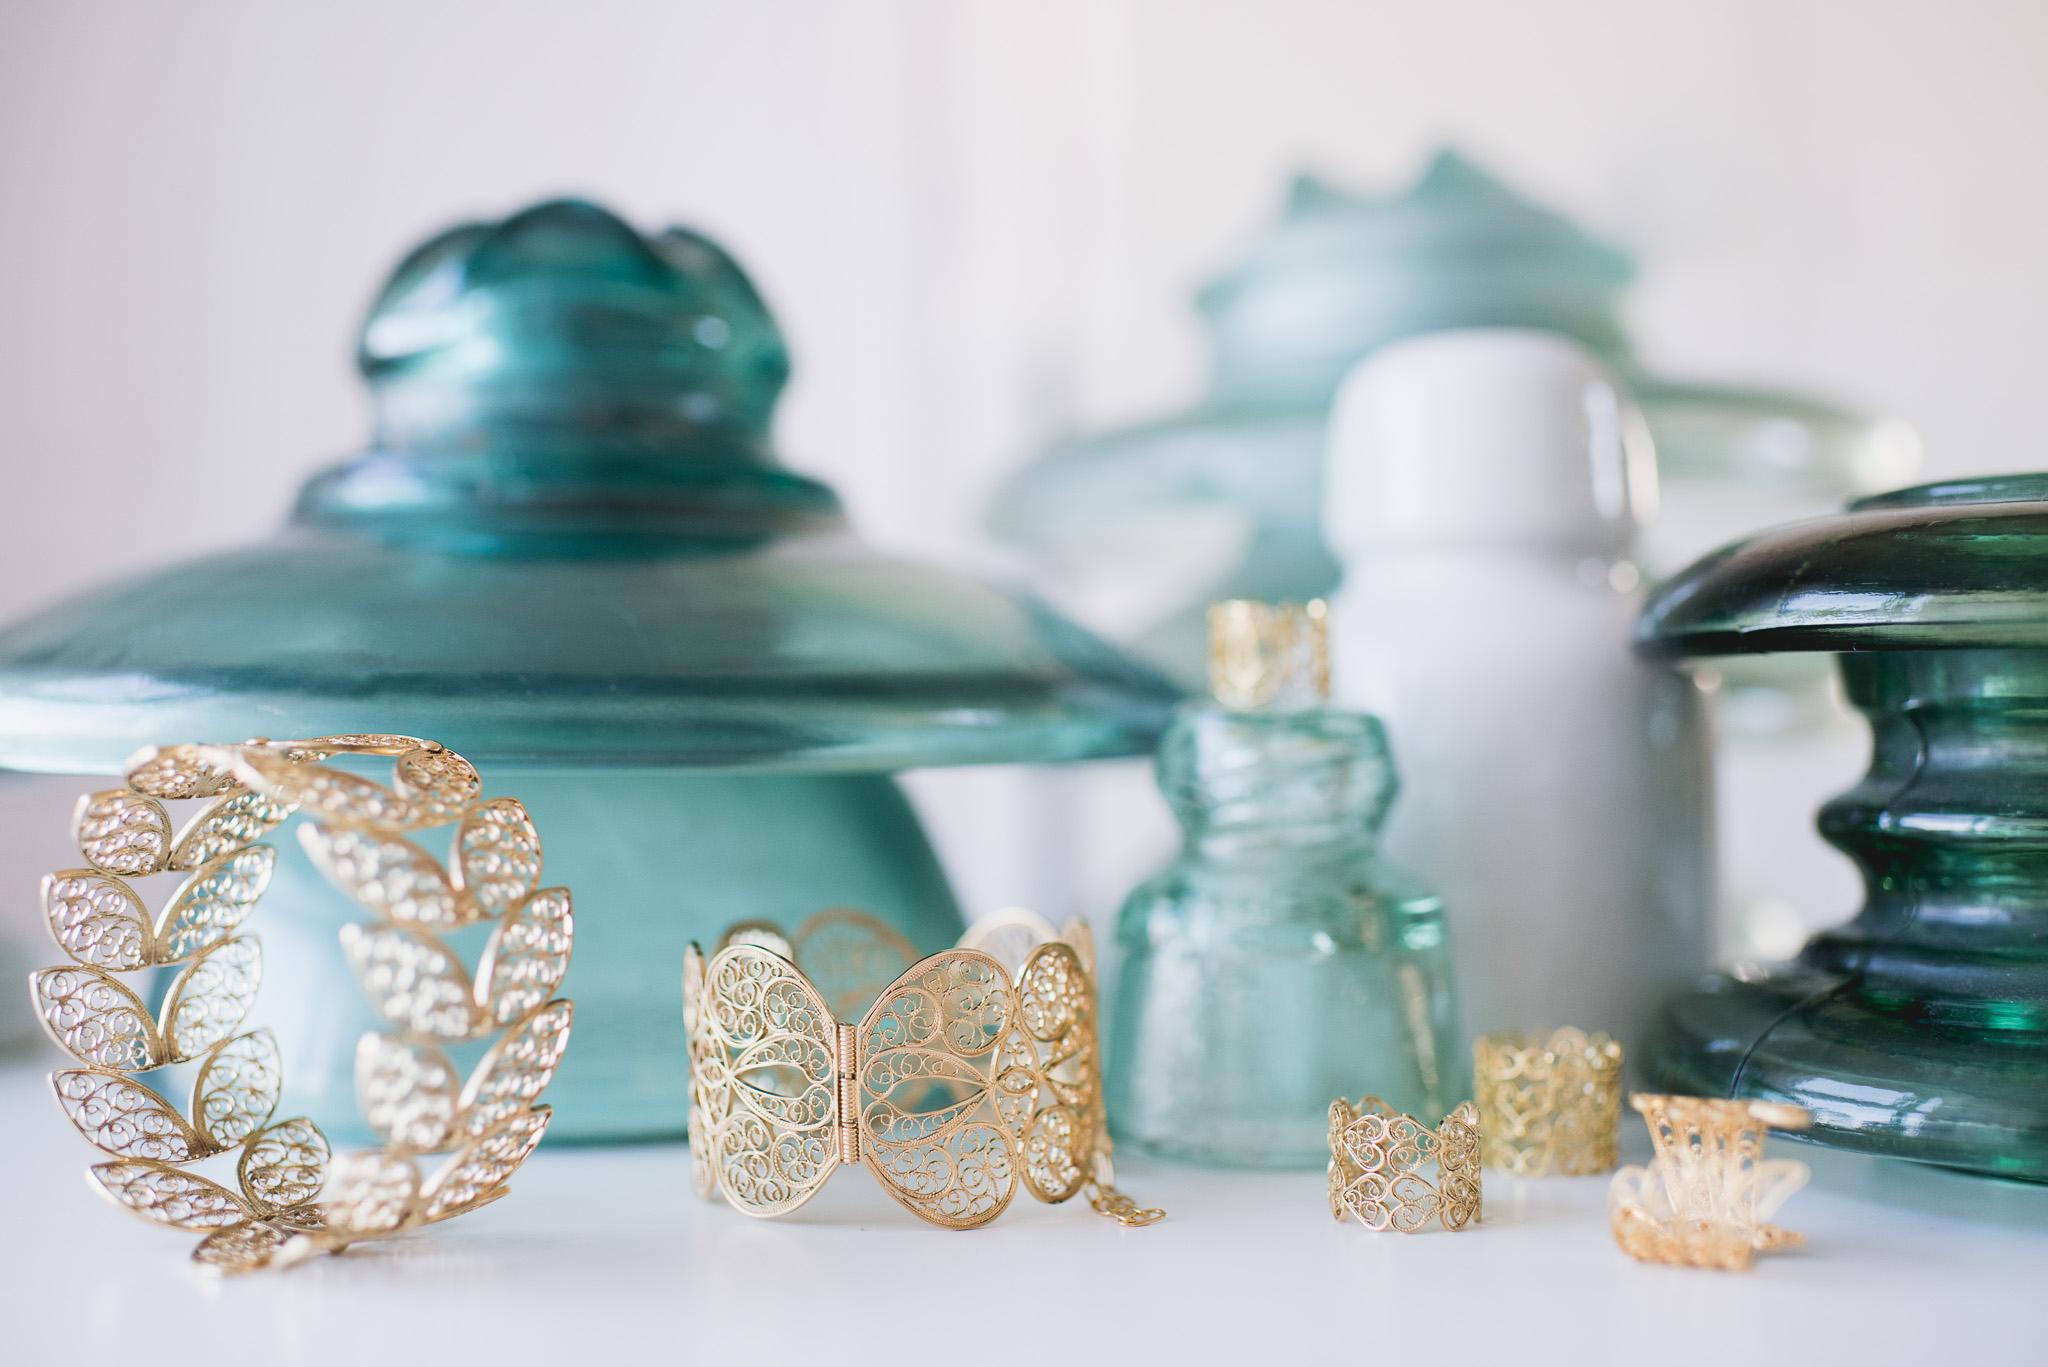 Arabel_Lebrusan_Jewellery_Emma_Hare_Photography__Ethical_Engagement_Rings-8.jpg